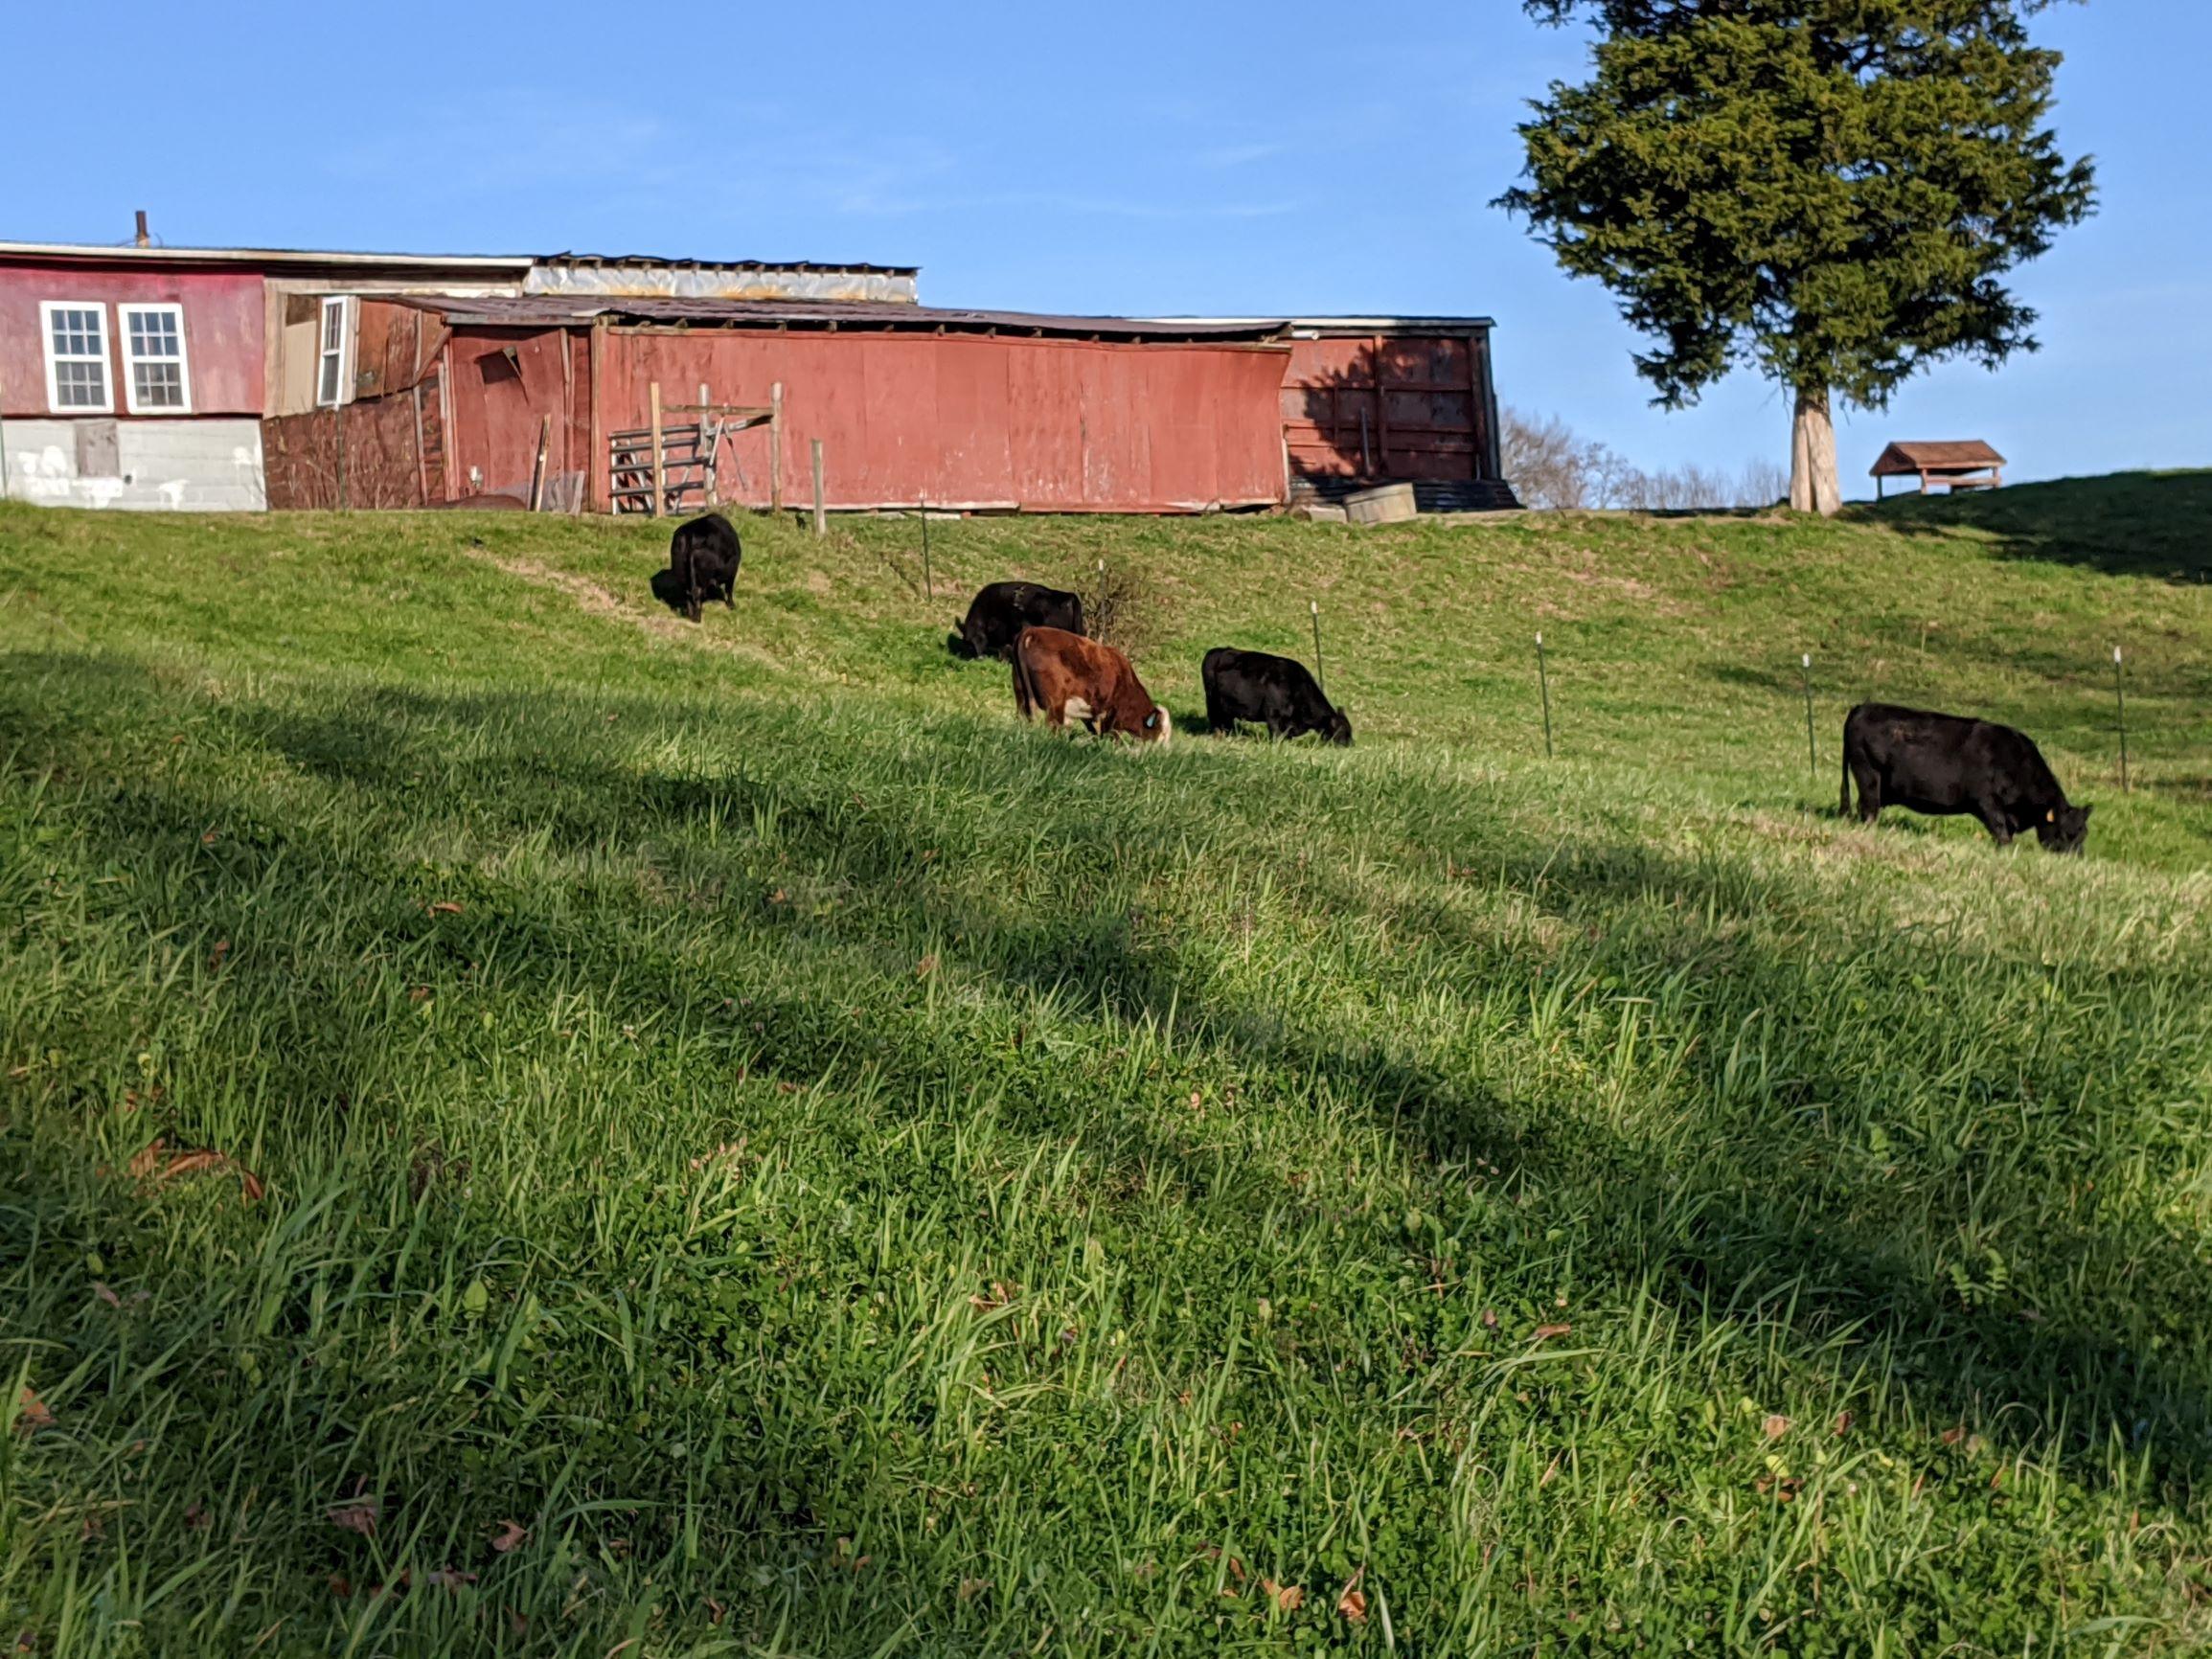 Enjoying grazing on the hill